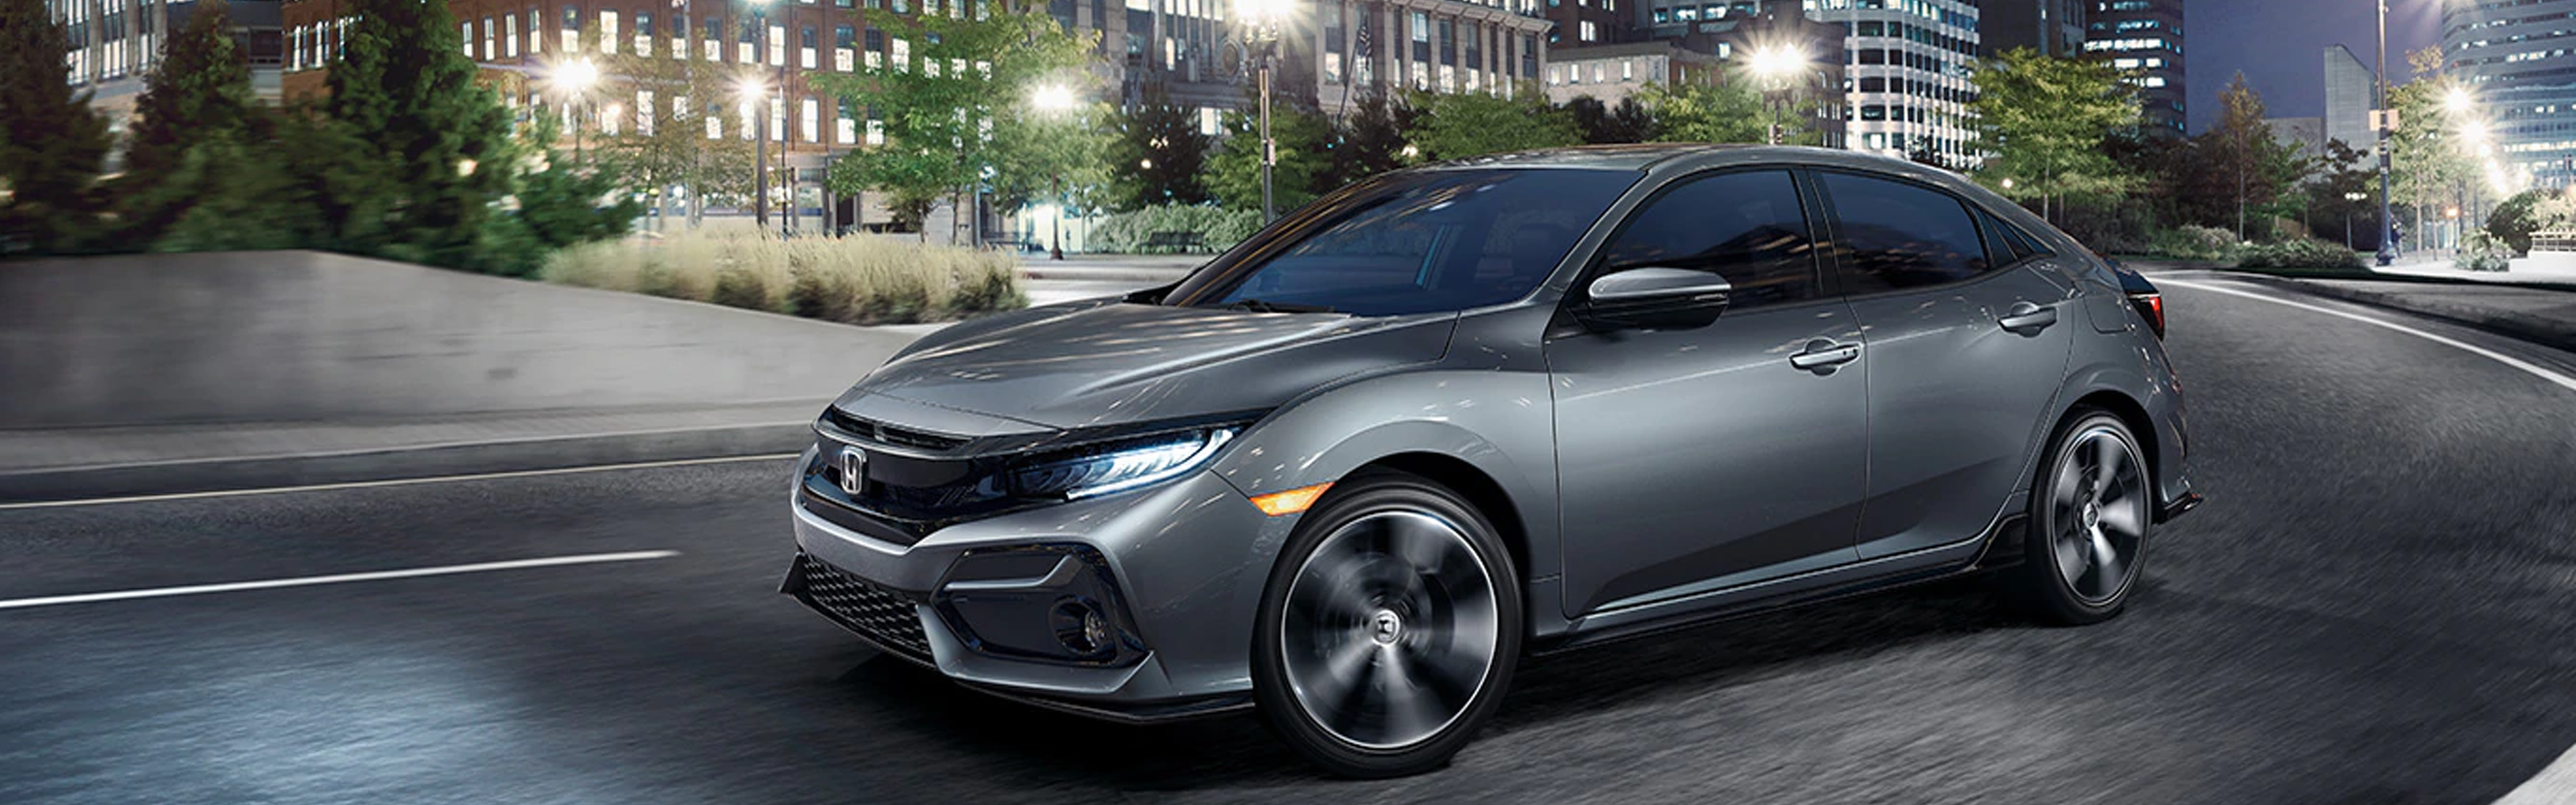 2020 Honda Civic Hatchbacks For Sale In New Glasgow, Nova Scotia